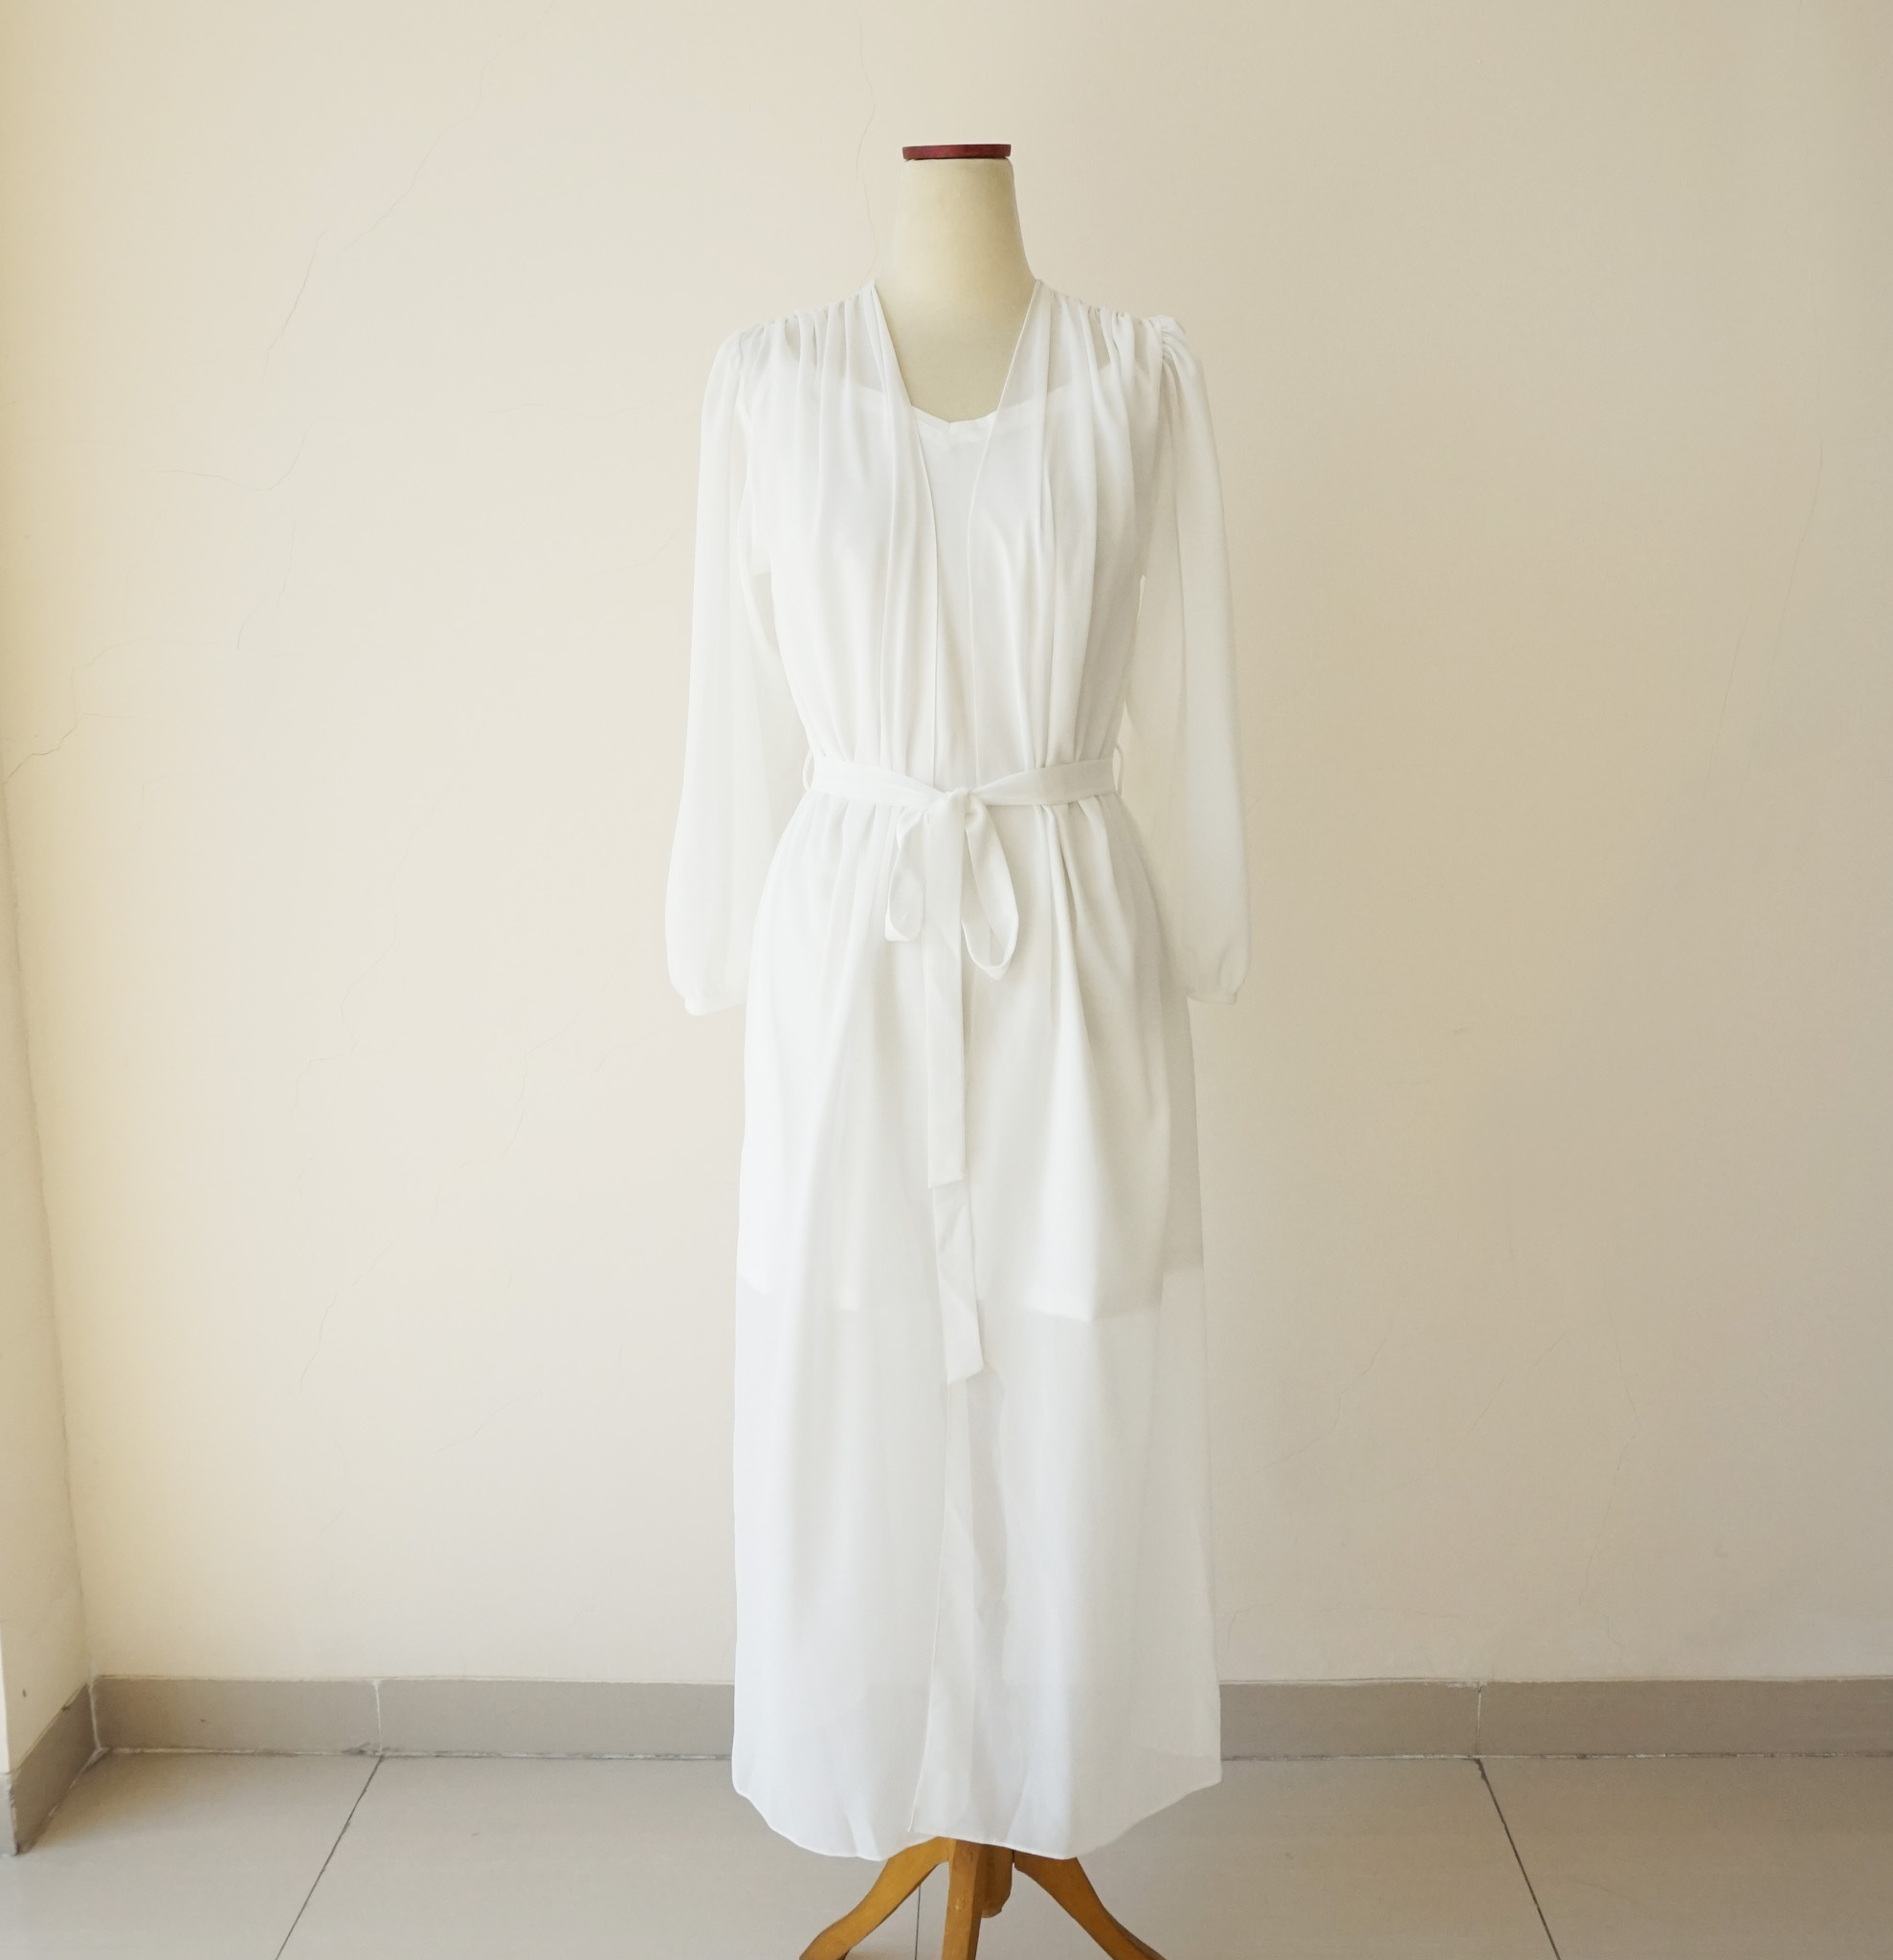 Fairytale Robe